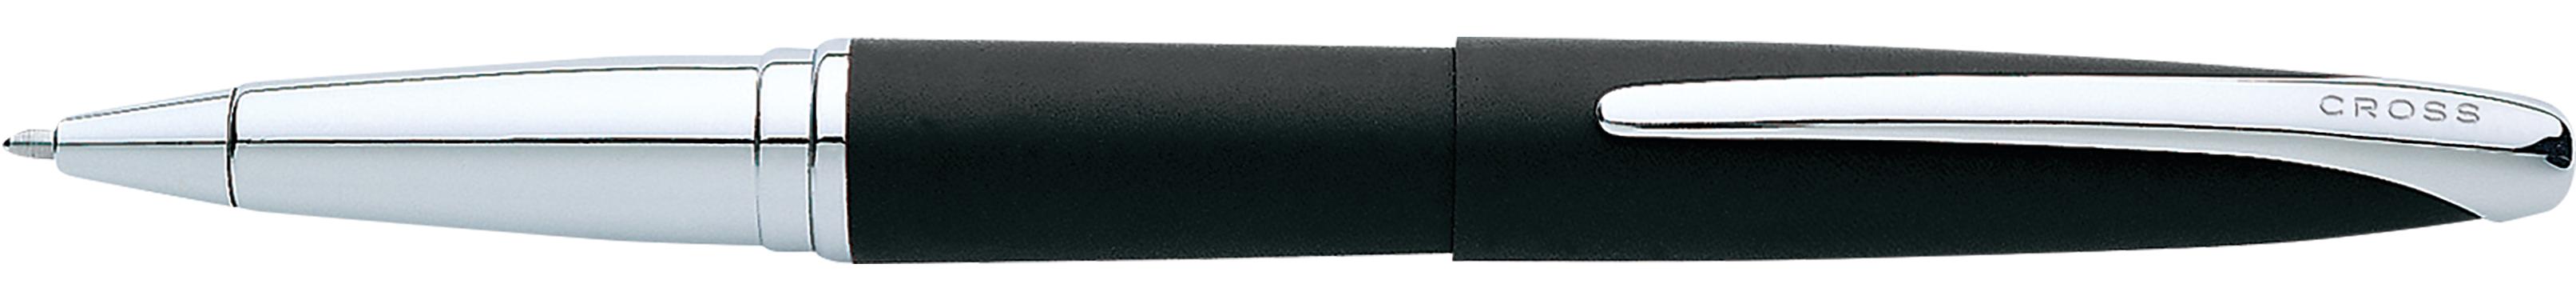 ATX Basalt Black Rollerball Pen